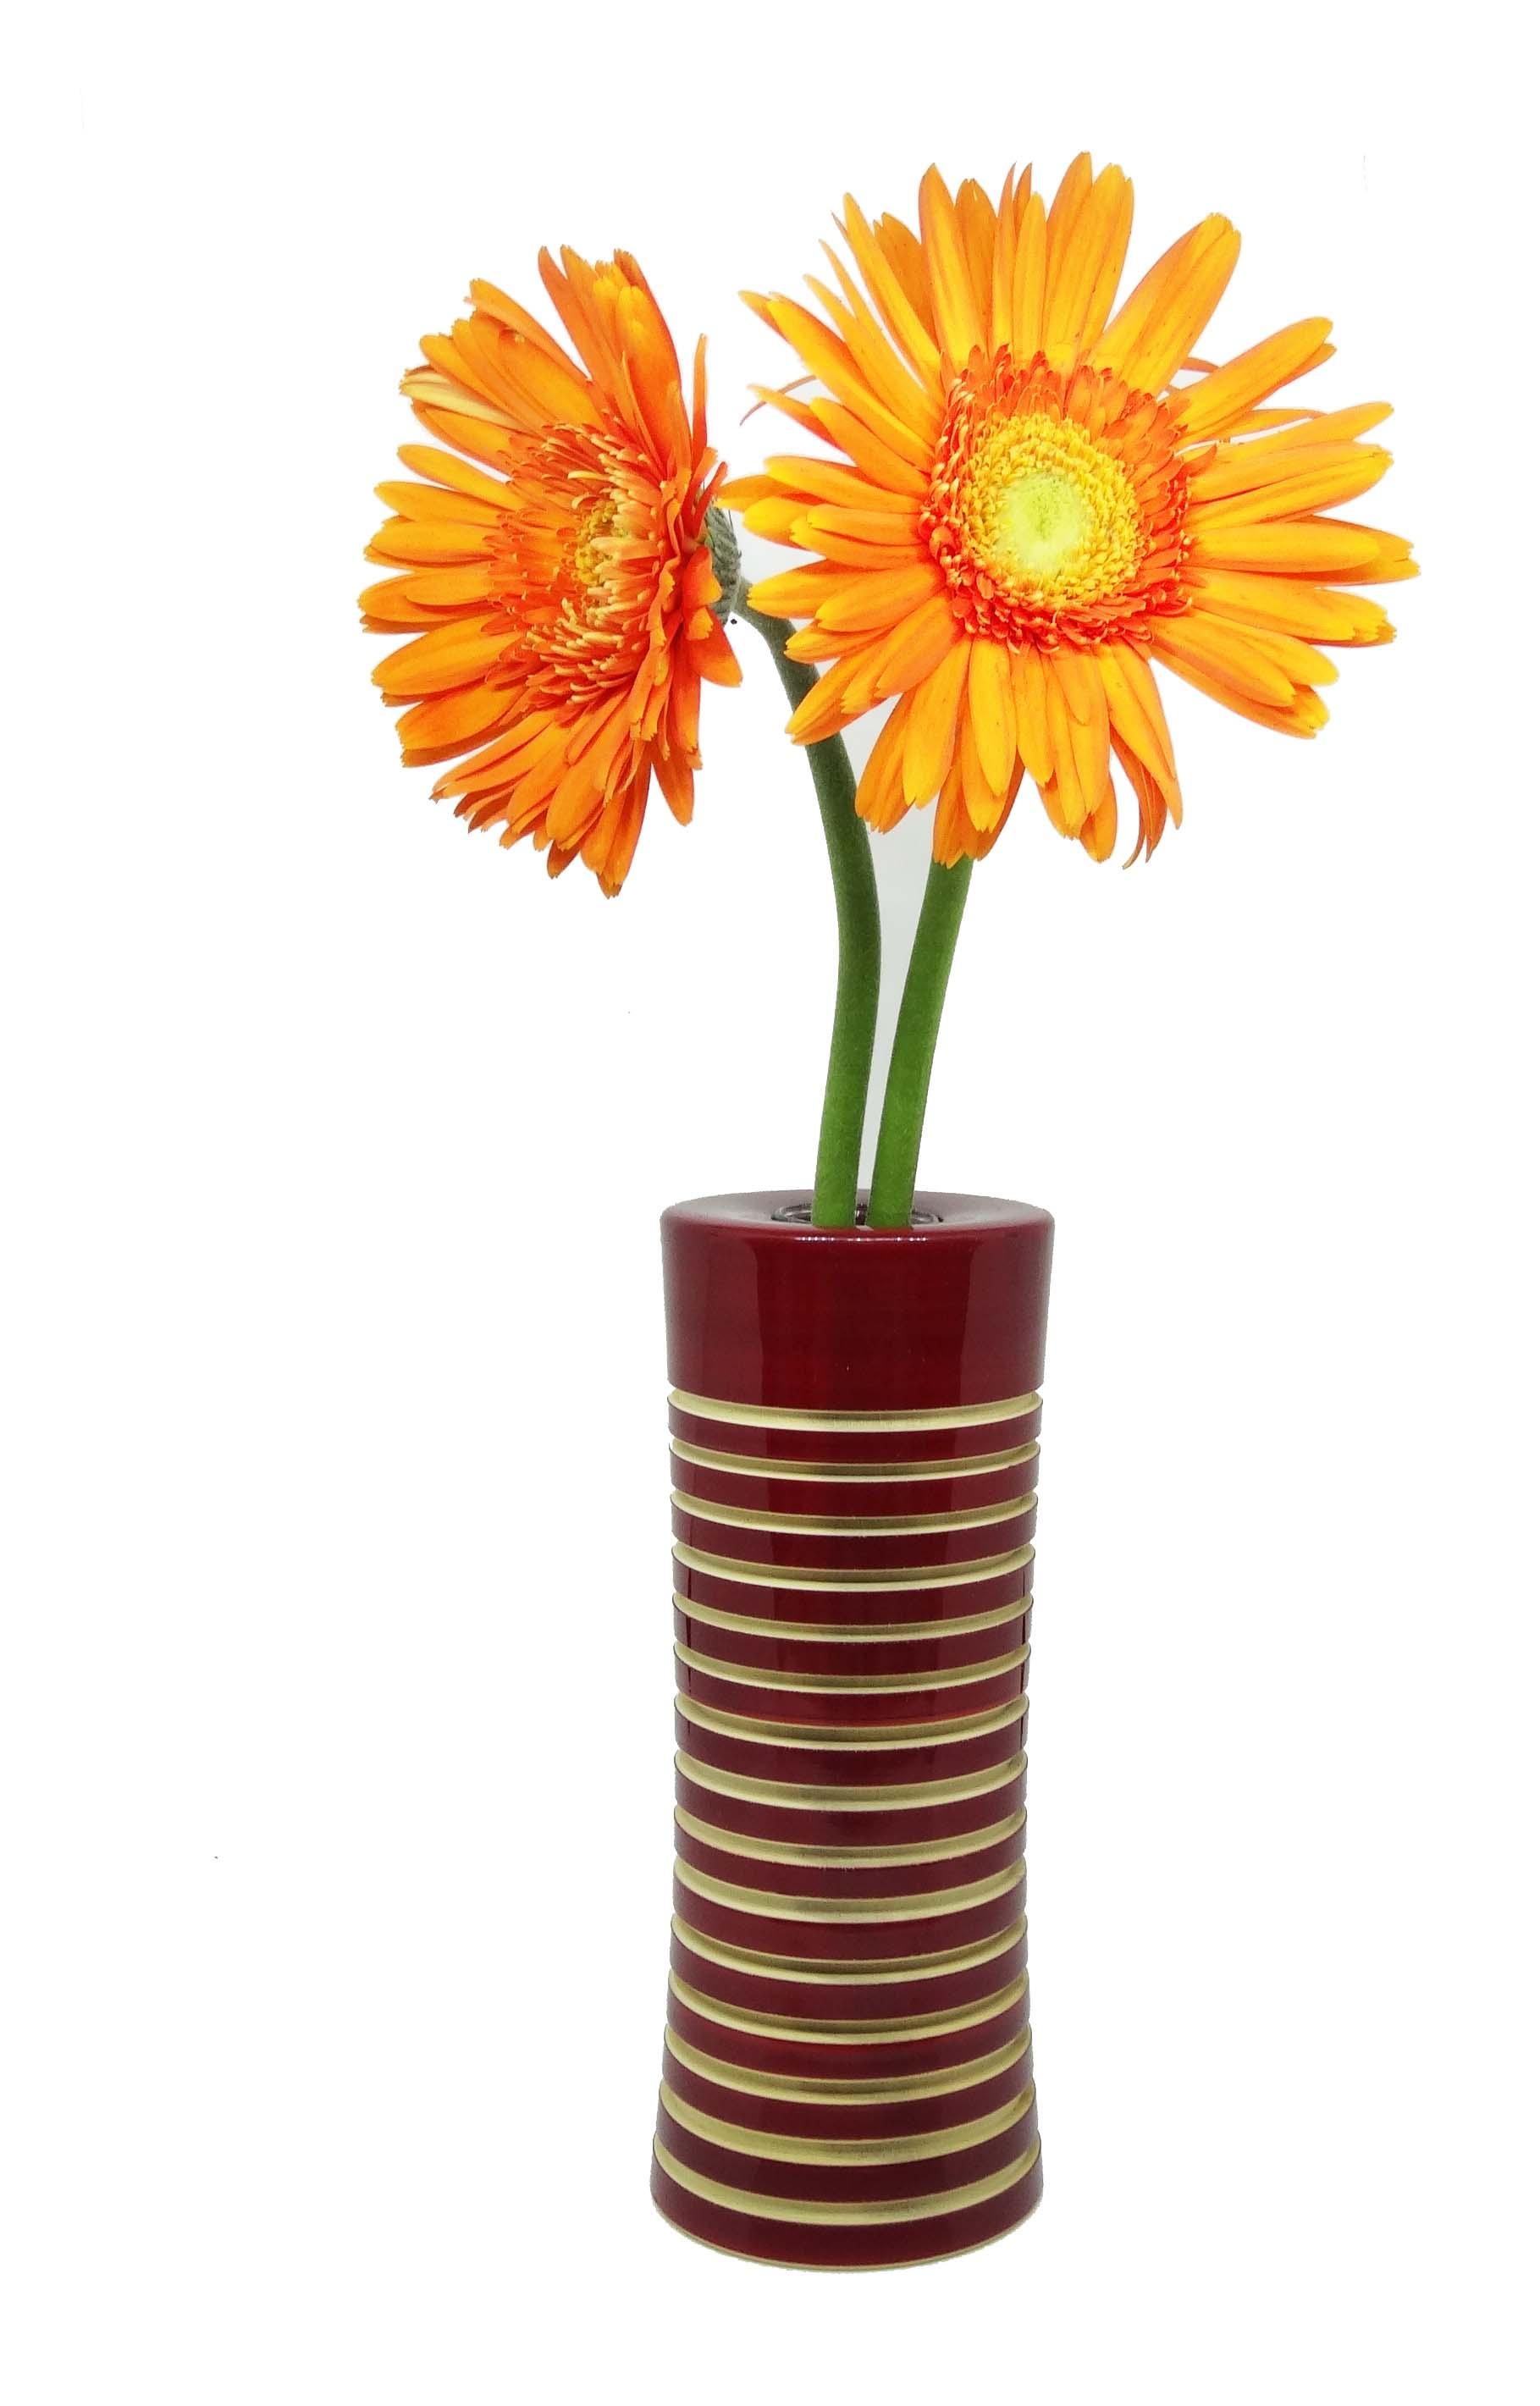 281 & Organic handcrafted wooden flower vase - Maroon - Vases ...